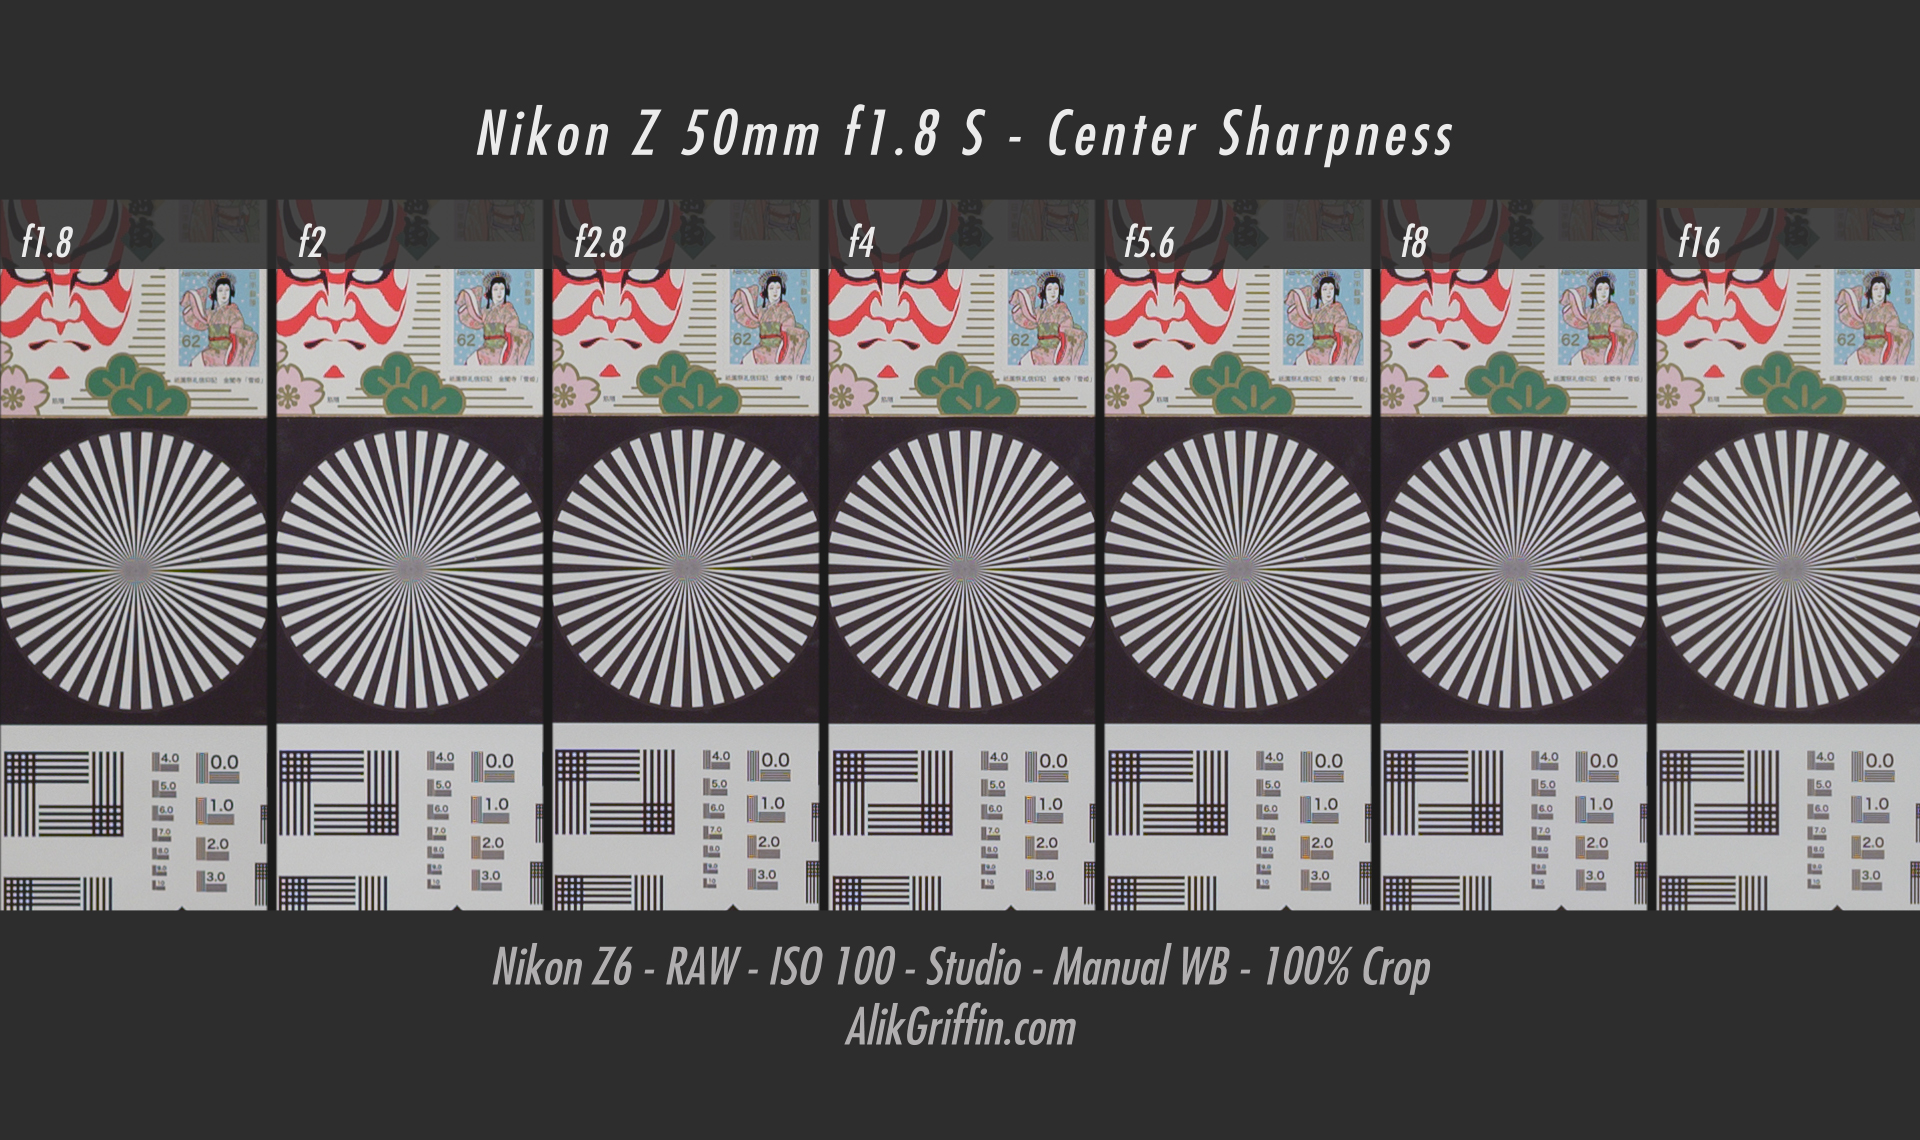 Nikon 50mm f1.8 S Center Sharpness